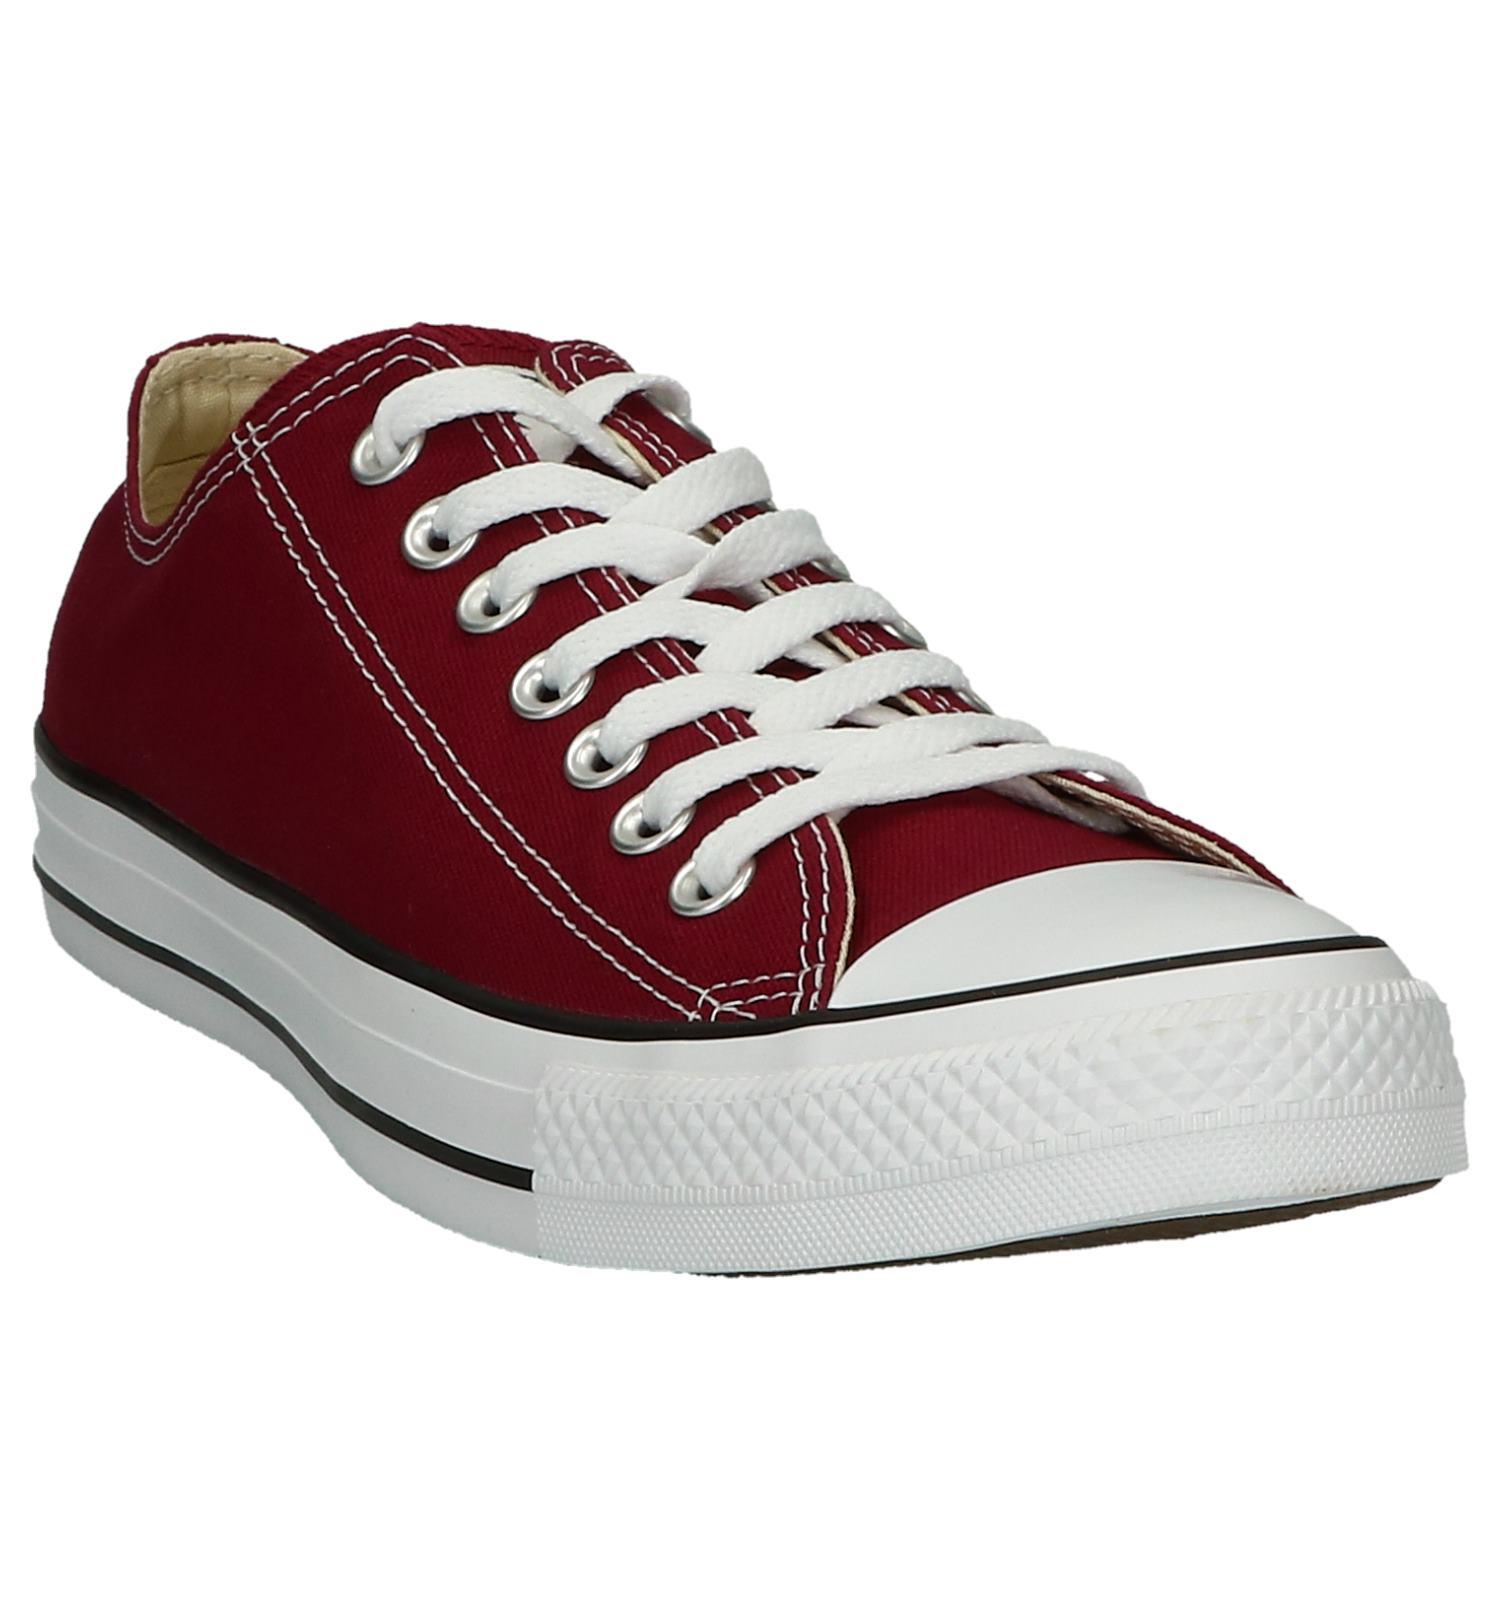 Converse Bordeaux Chuck Sneakers All Star Taylor wON8kXnP0